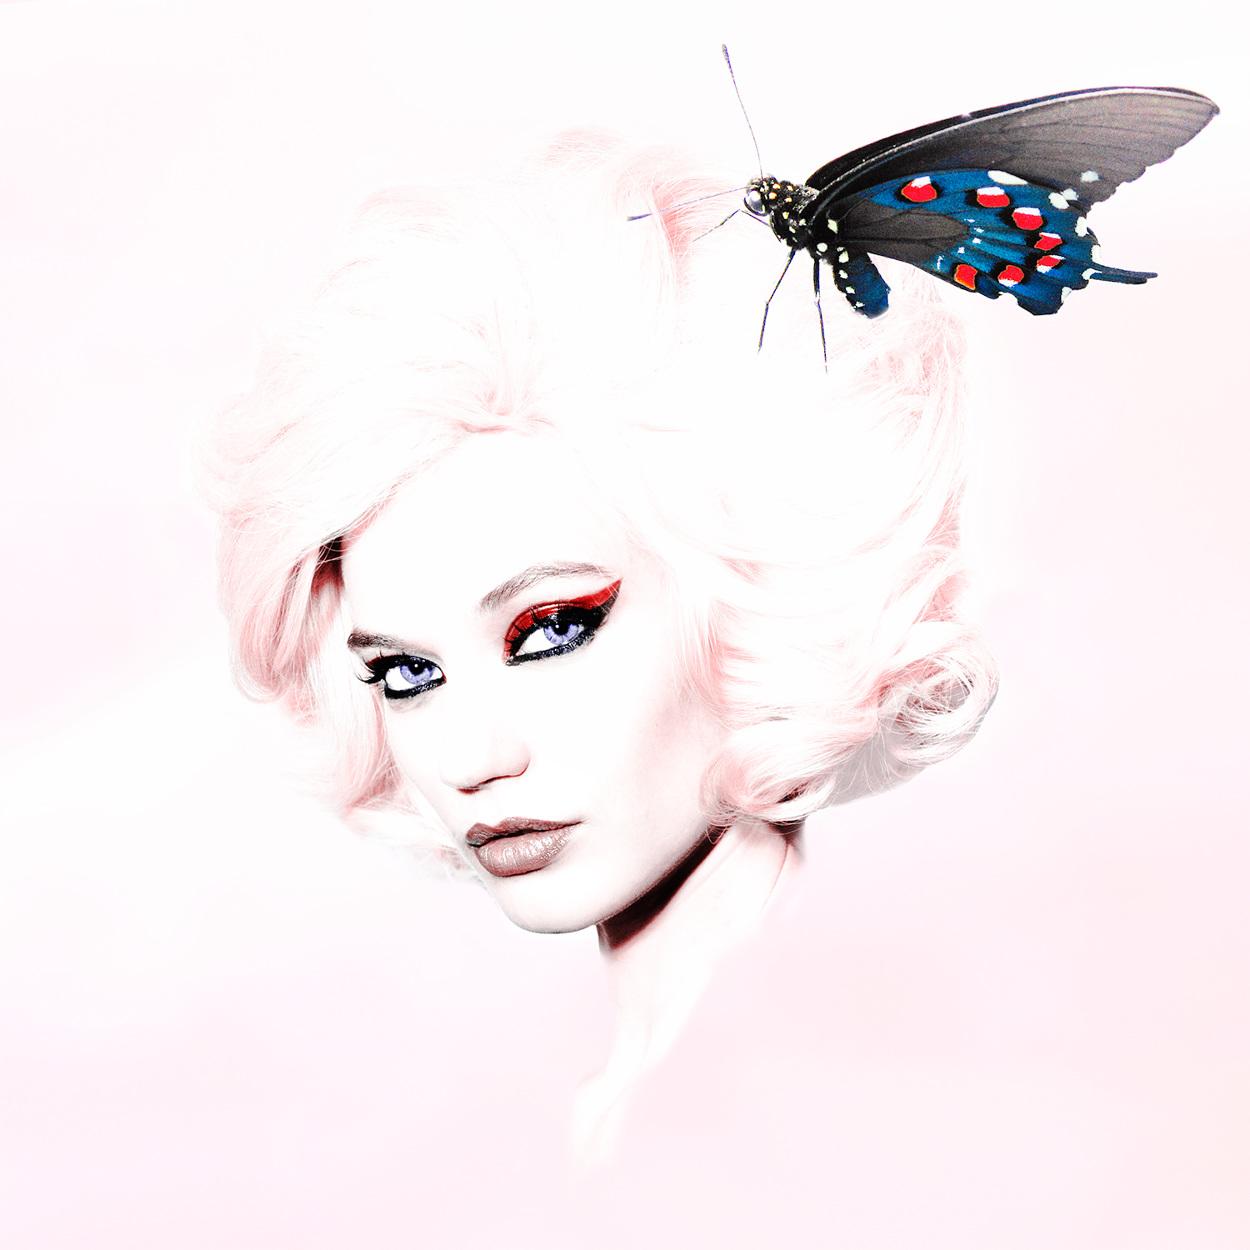 blondsButterflyFlat-copy_1250.jpg